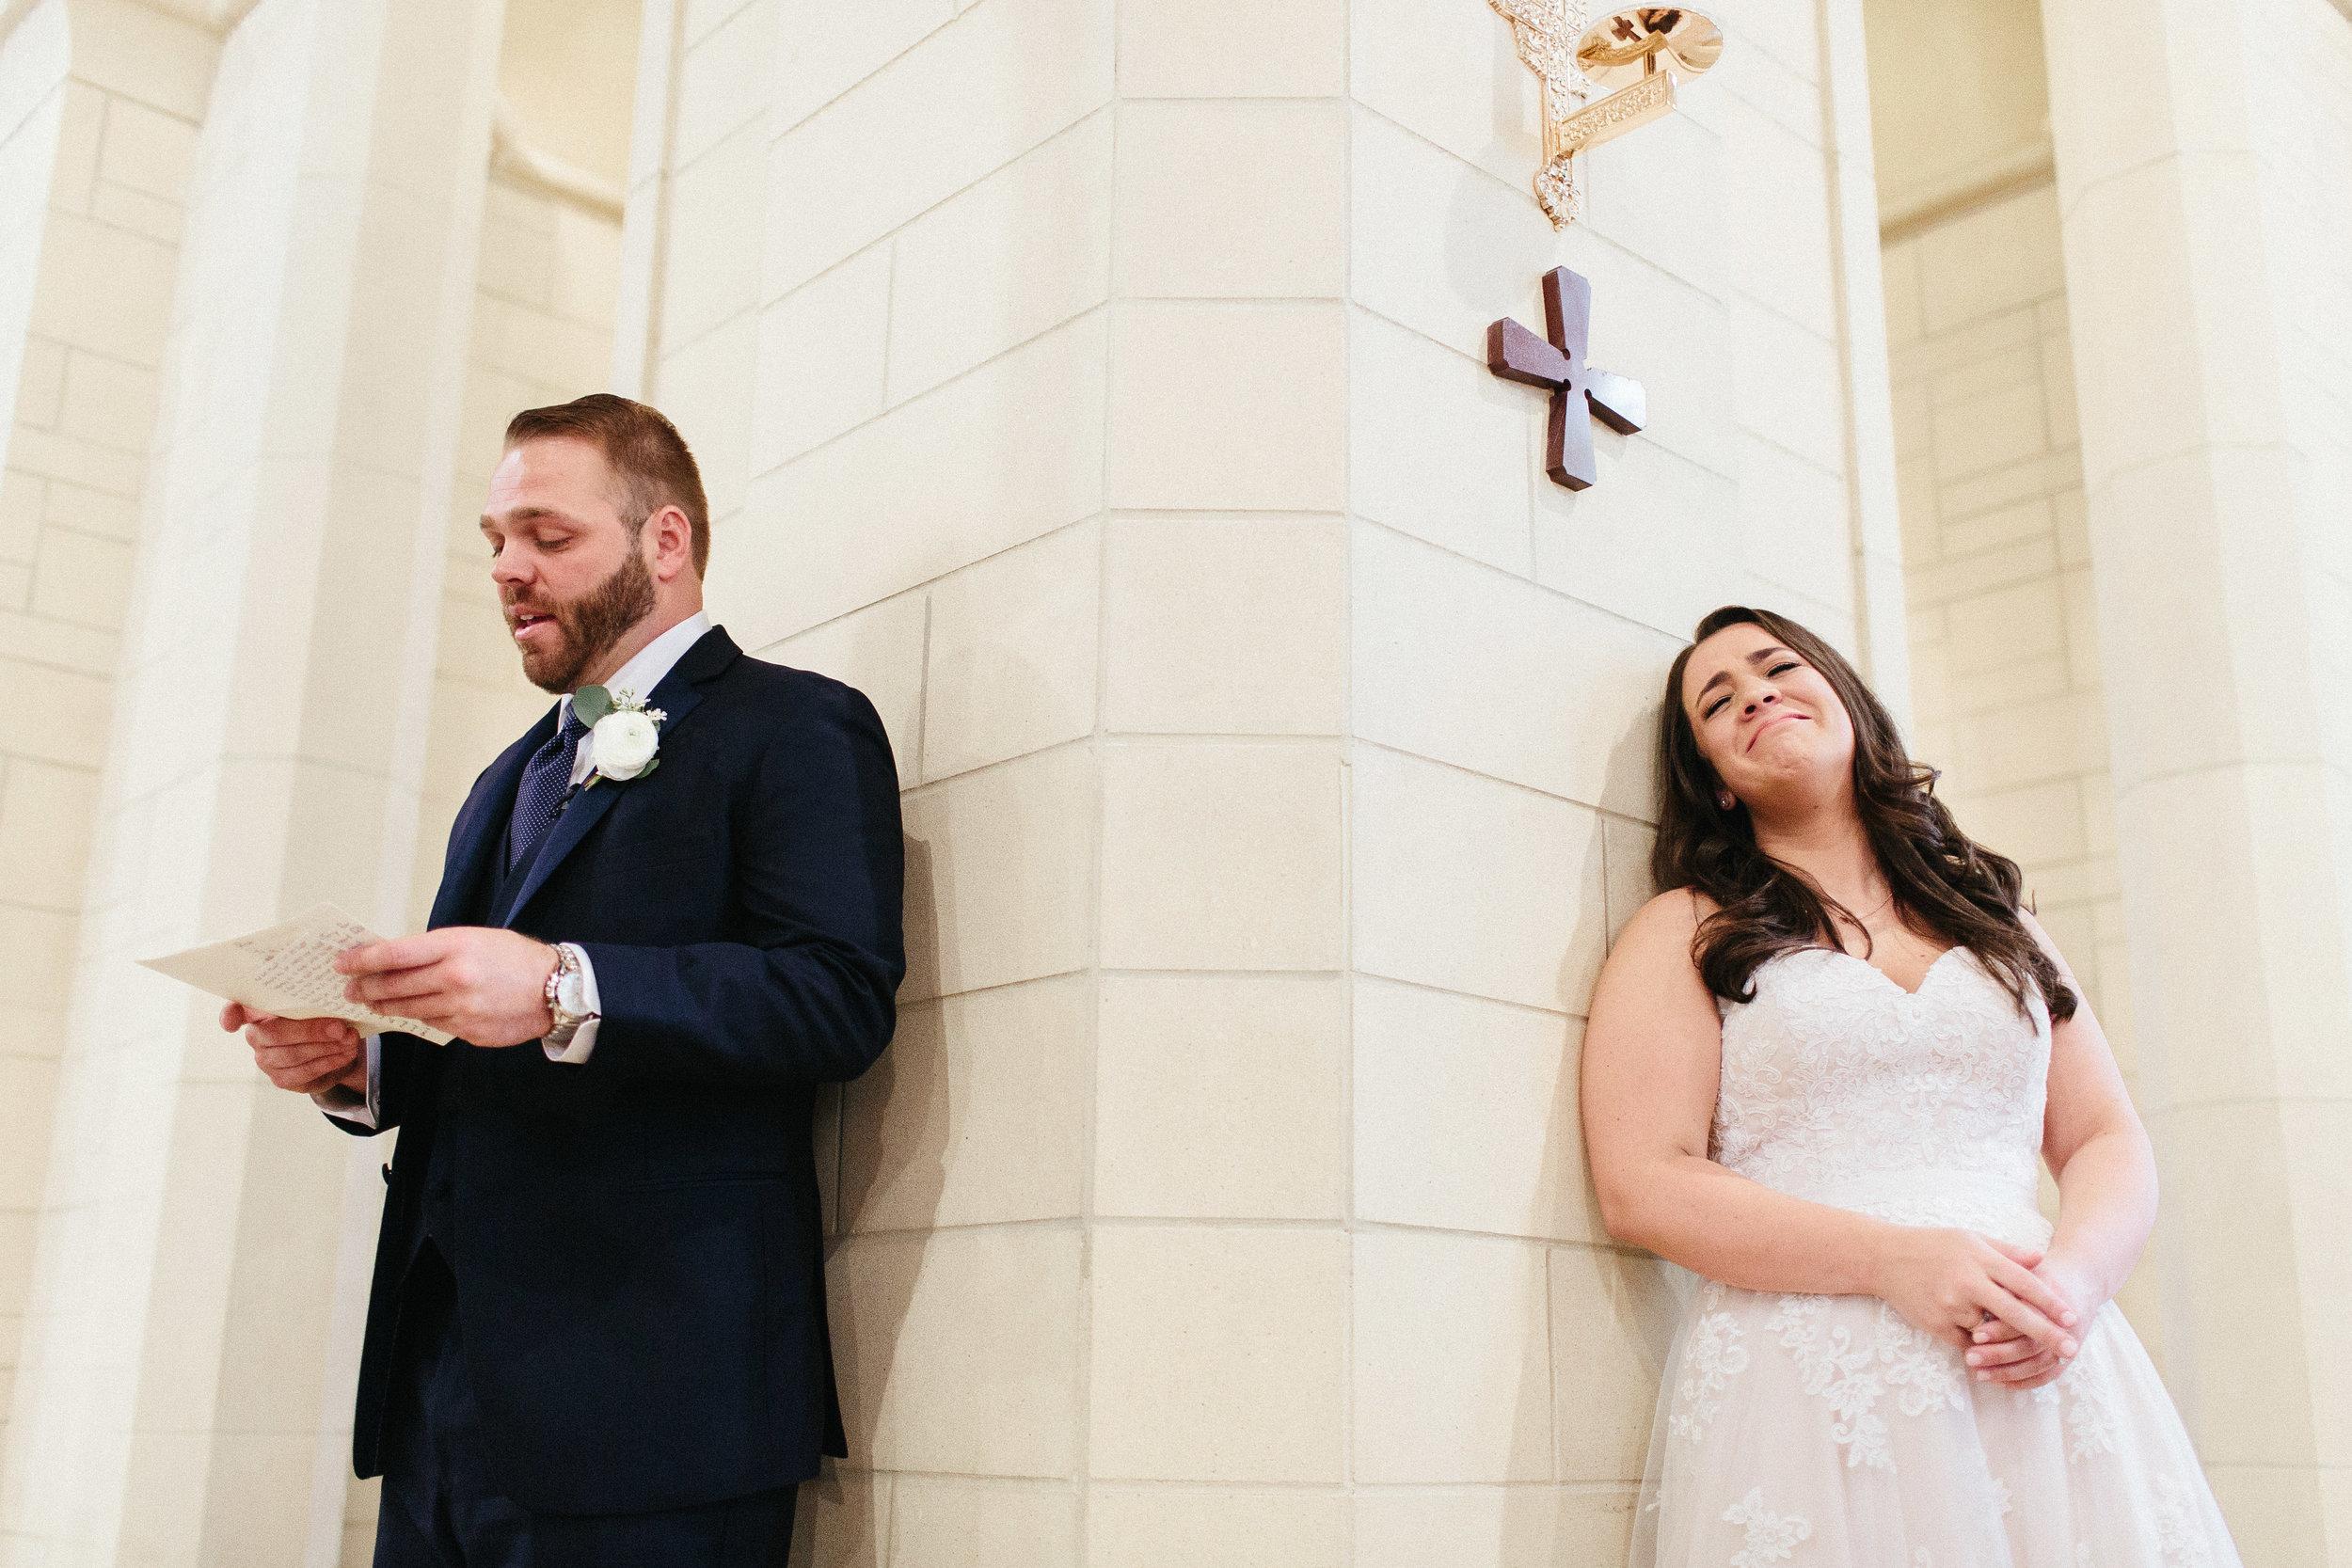 roswell_st_peter_chanel_catholic_avalon_hotel_alpharetta_wedding-1232.jpg